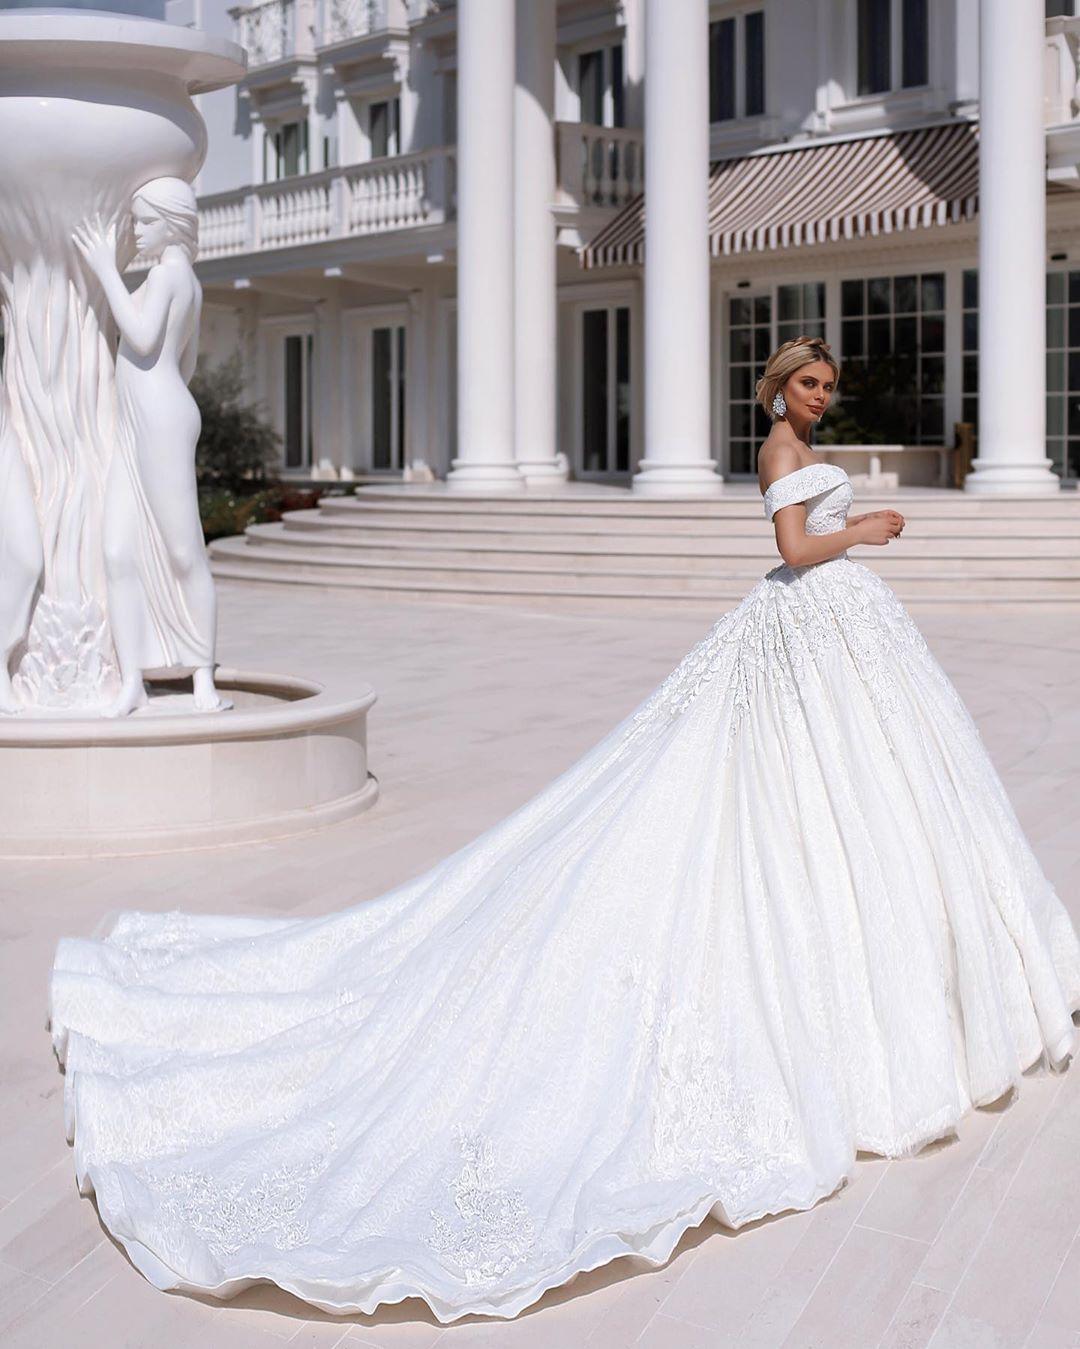 Pin By Eliane Abou Chacra Mahfouz On My Fashion Guide Summer Wedding Dress Fall Wedding Dresses Outdoor Wedding Dress Lace [ 1349 x 1080 Pixel ]